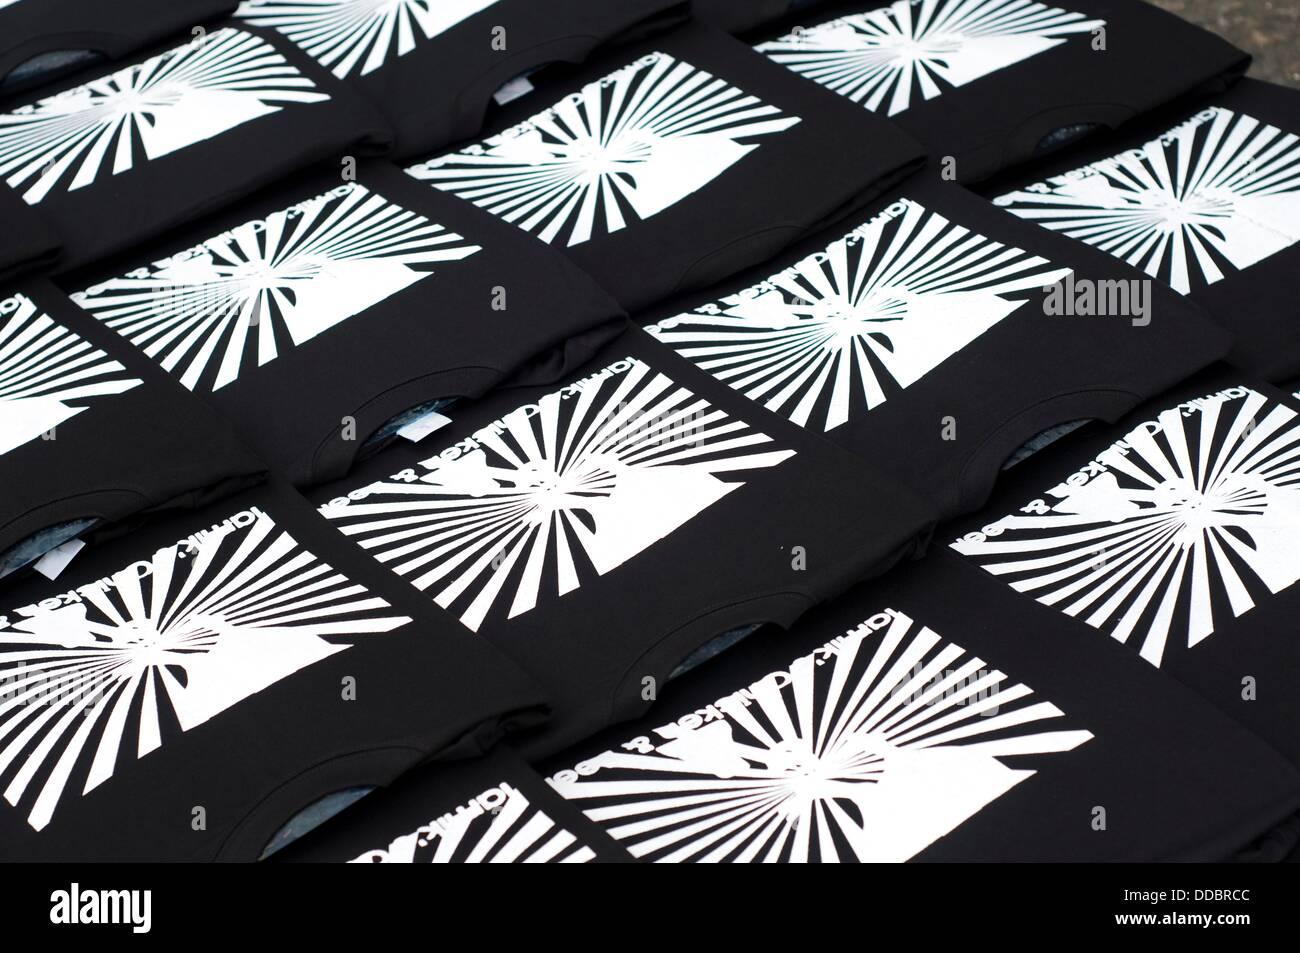 Tee Shirt Design Cebu City Philippines Stock Photo 59881484 Alamy